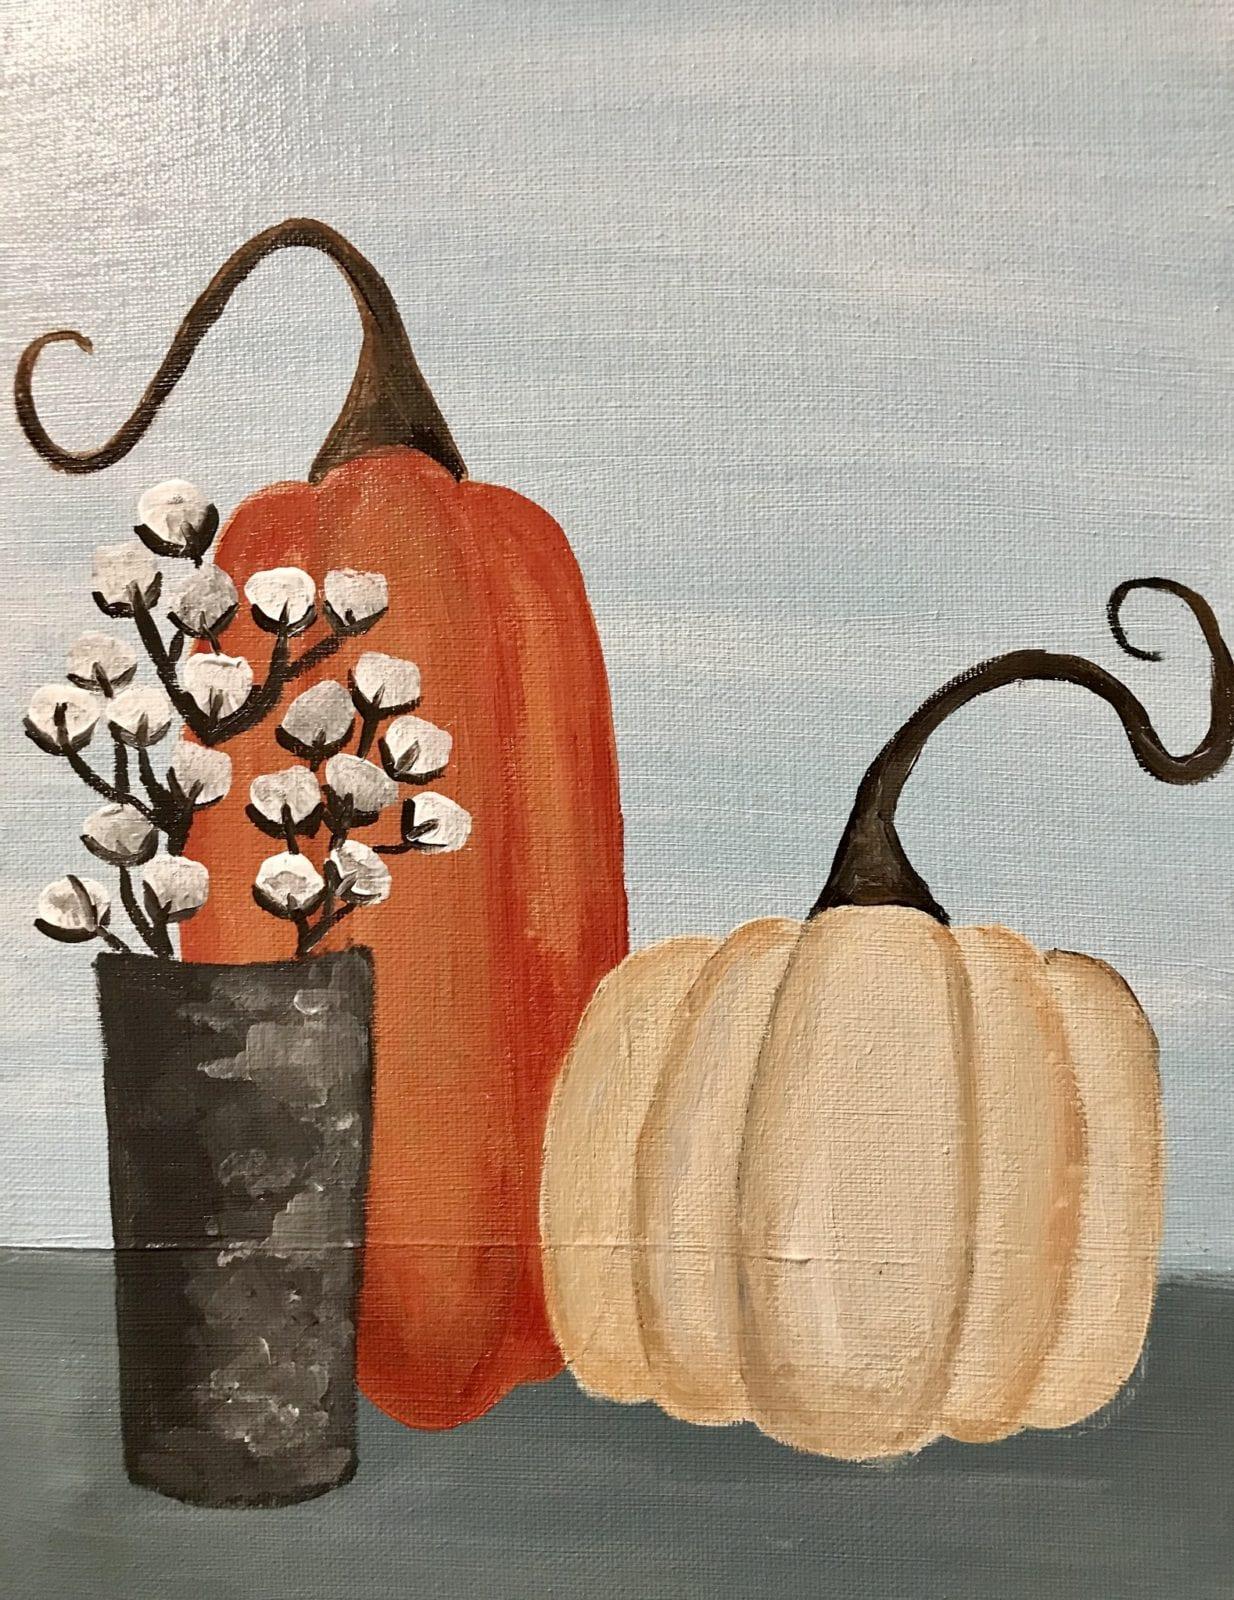 Pumpkins on Canvas